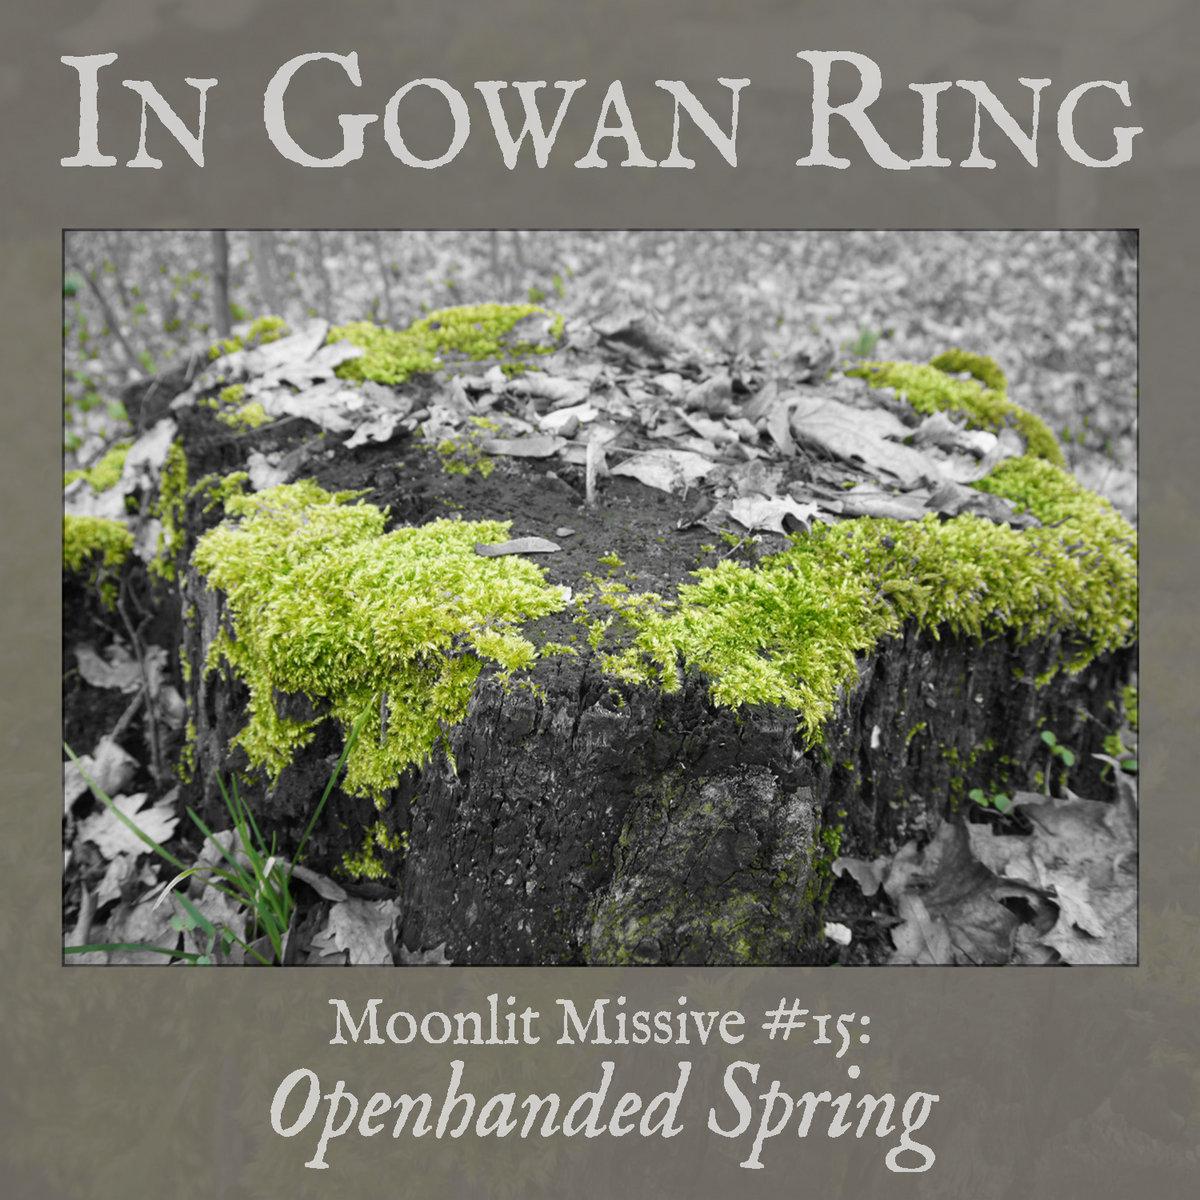 Openhanded Spring (Moonlit Missive #15)   In Gowan Ring